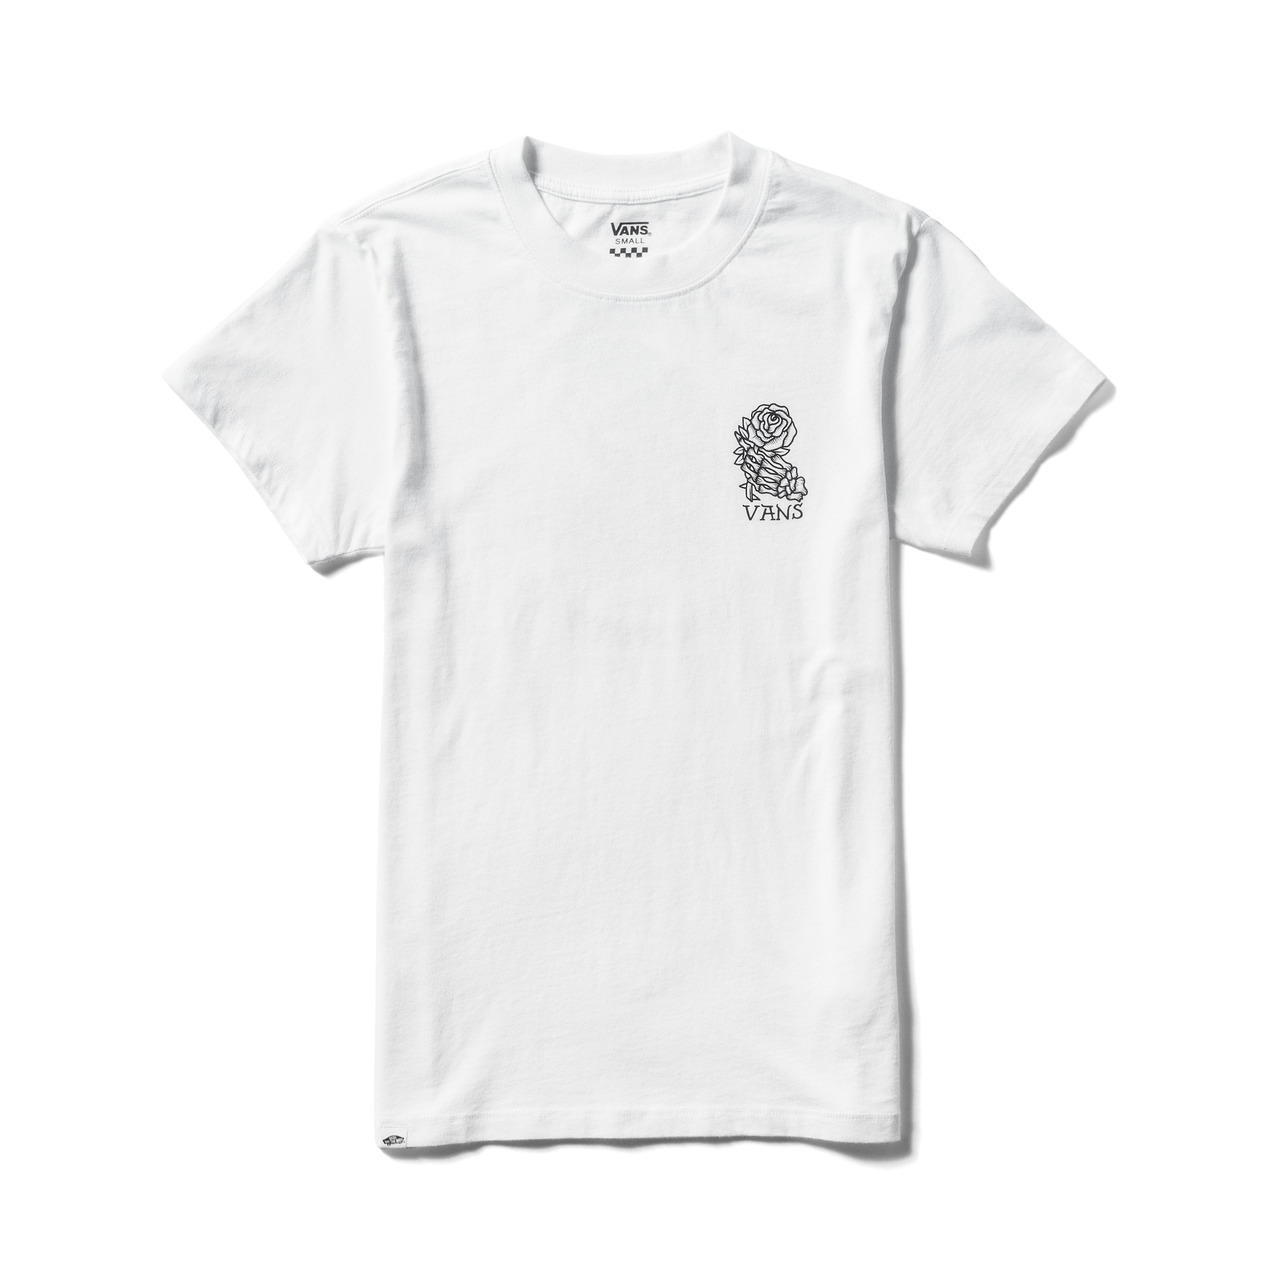 Original New Arrival Vans Skateboarding Men's Cotton O-neck T-Shirt Classic Tops Breathable Short Sleeve Tees VN0A3J2VBLK/WHT mens casual 3d personality skull printing short sleeve t shirt cotton sport black tees